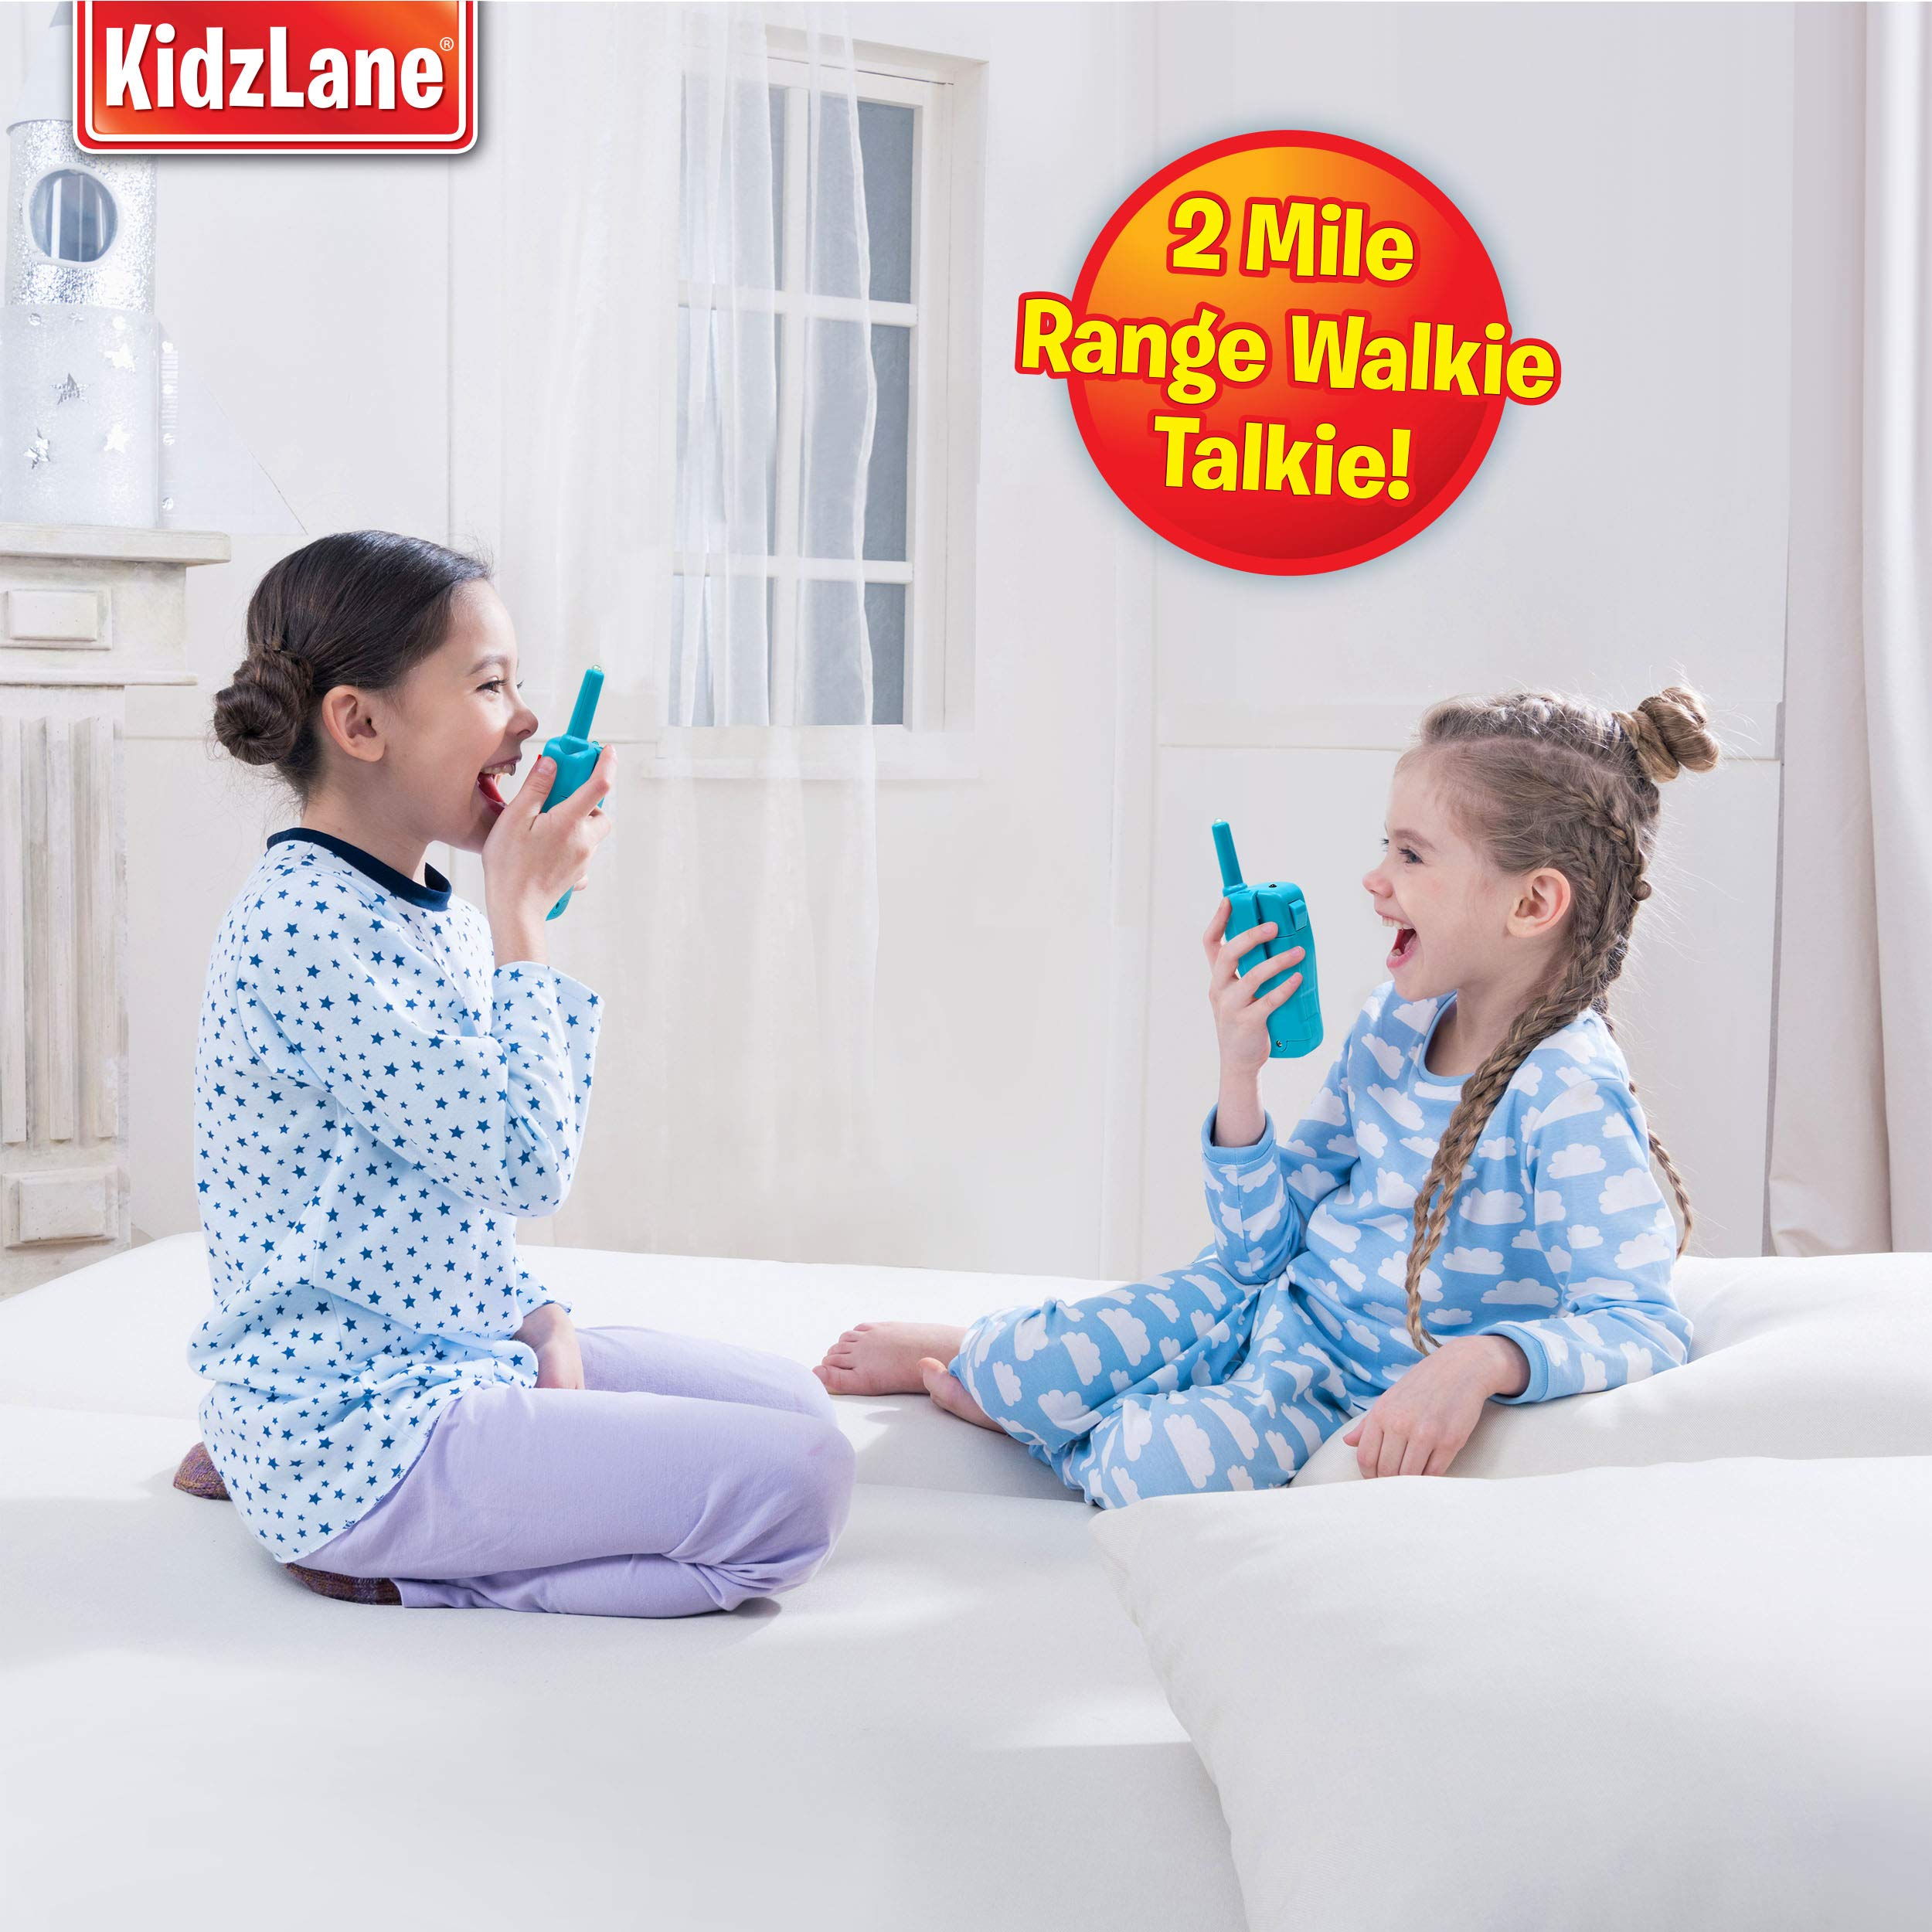 Kidzlane Voice Changing Walkie Talkies for Kids - 2 Mile Range, 8 Channels, Flashlight, & Call Alert by Kidzlane (Image #4)